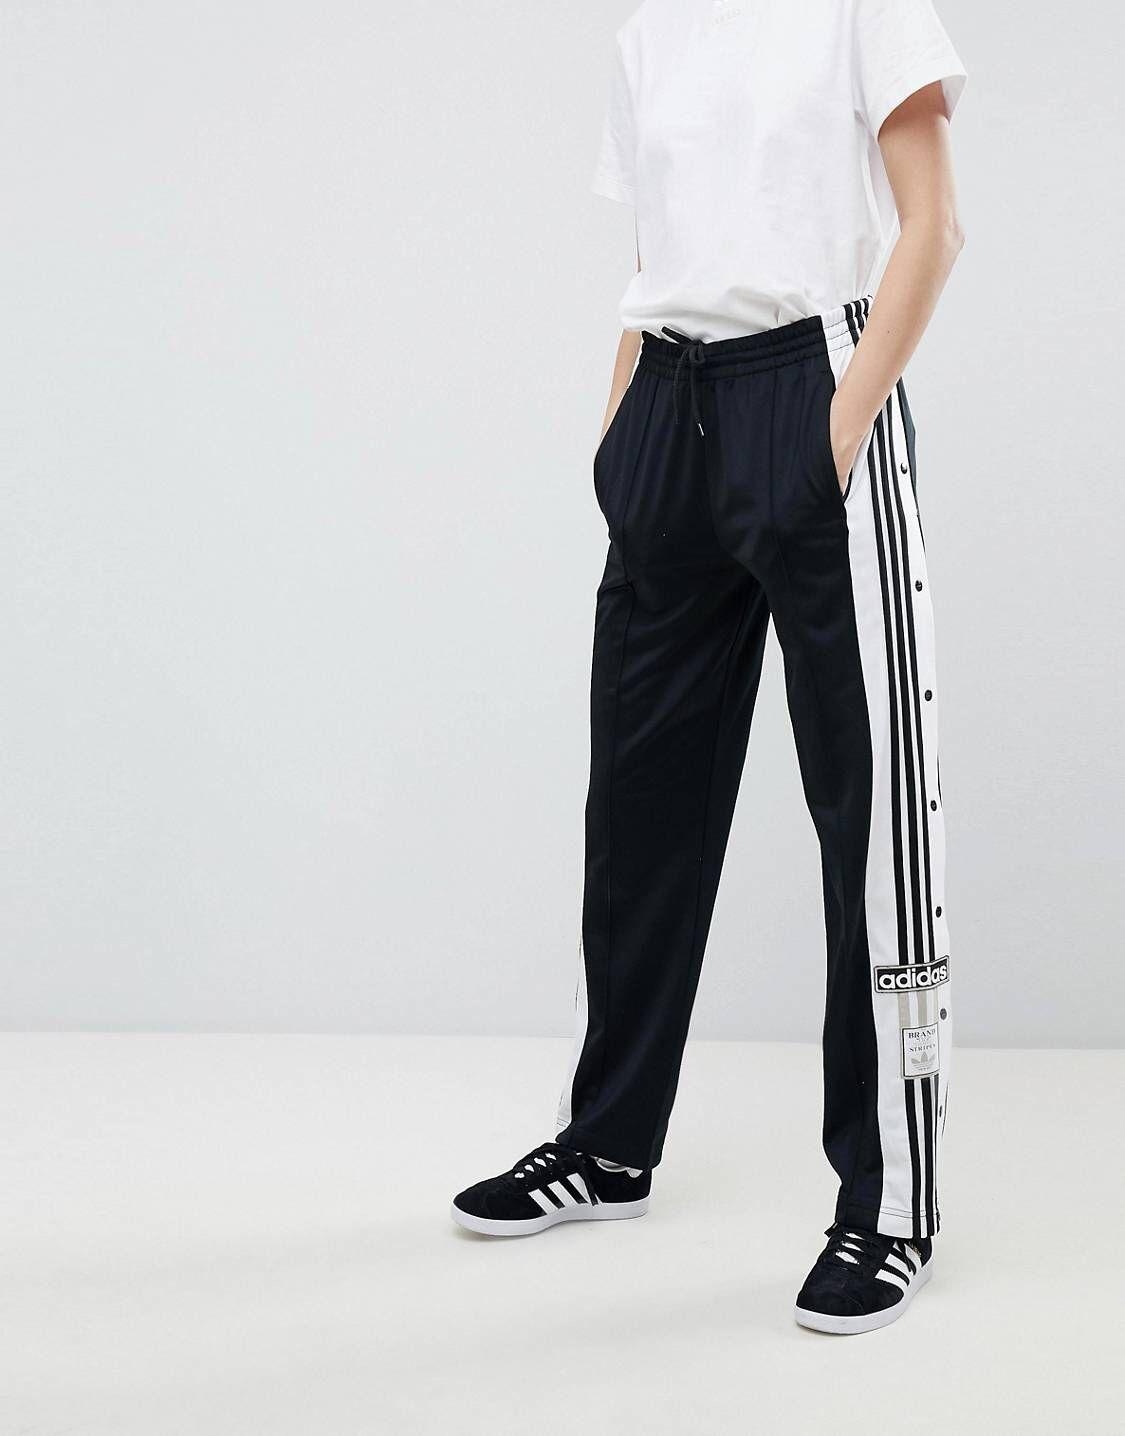 pantalon adidas bouton